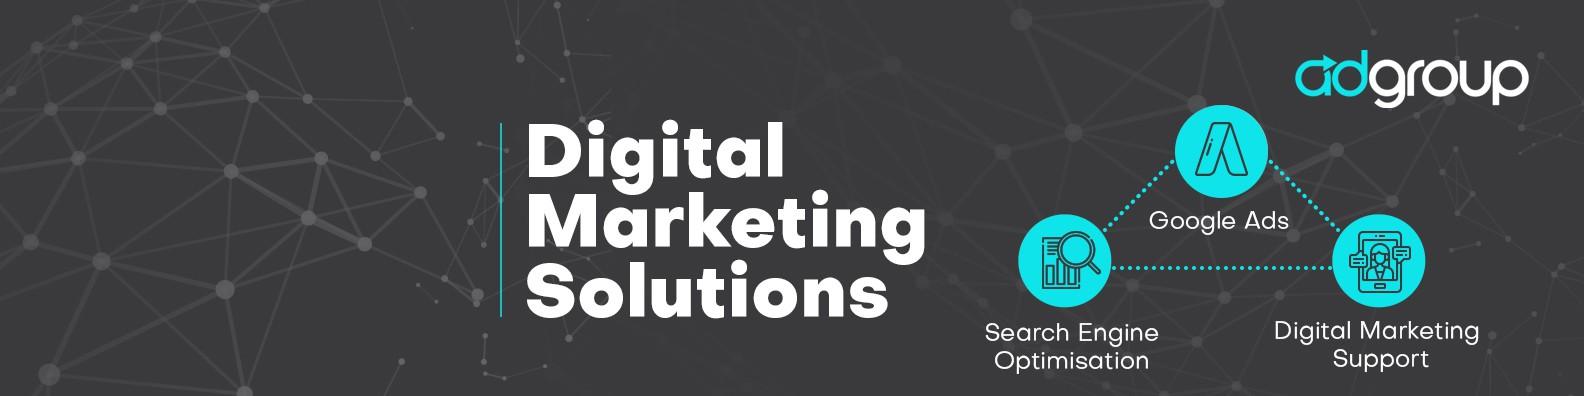 LinkedIn Banner - Digital Marketing Consultant